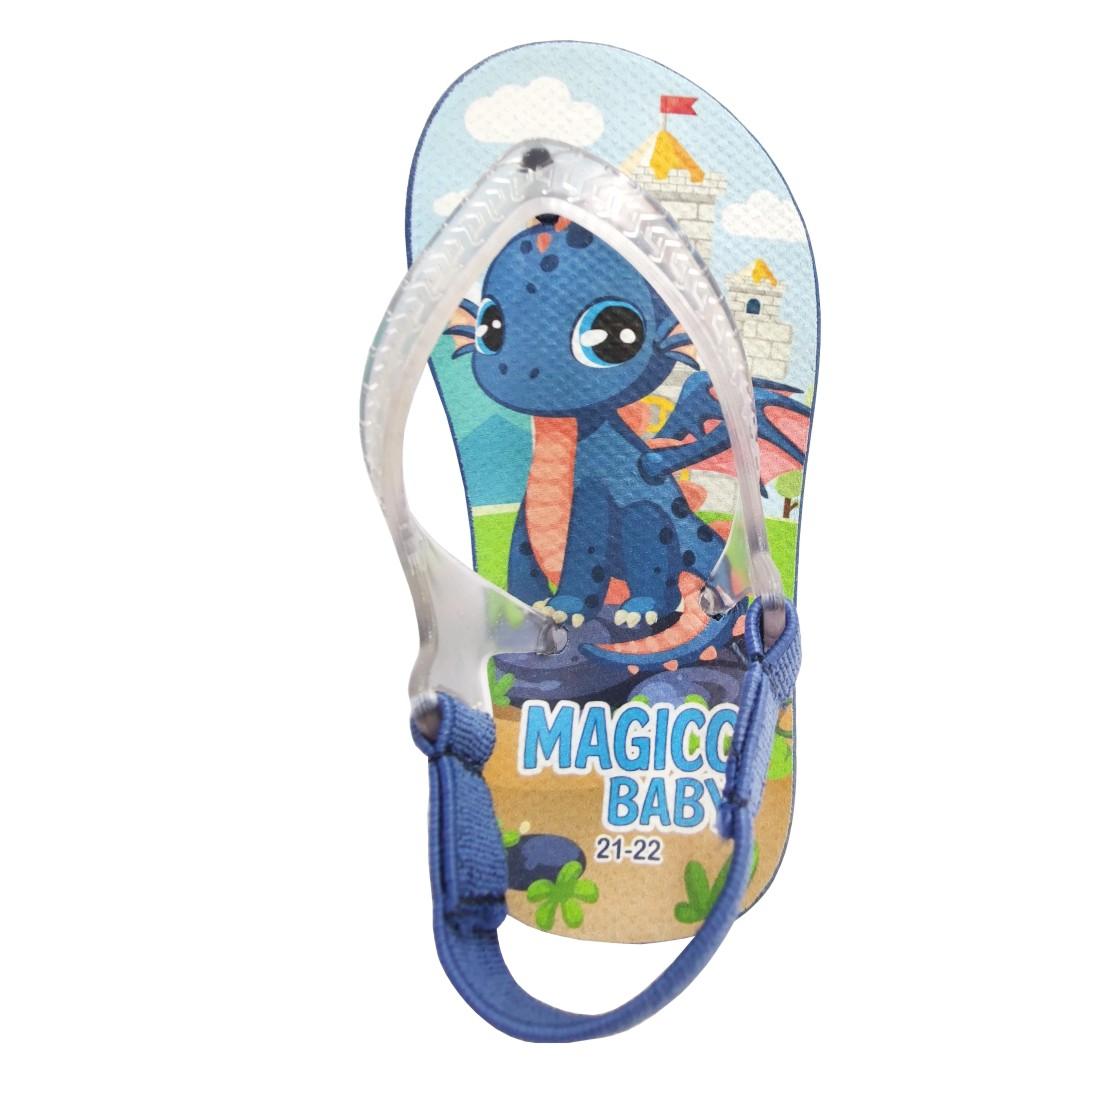 Chinelo Menino Bebê Sandália Dragão Azul Magicc Baby